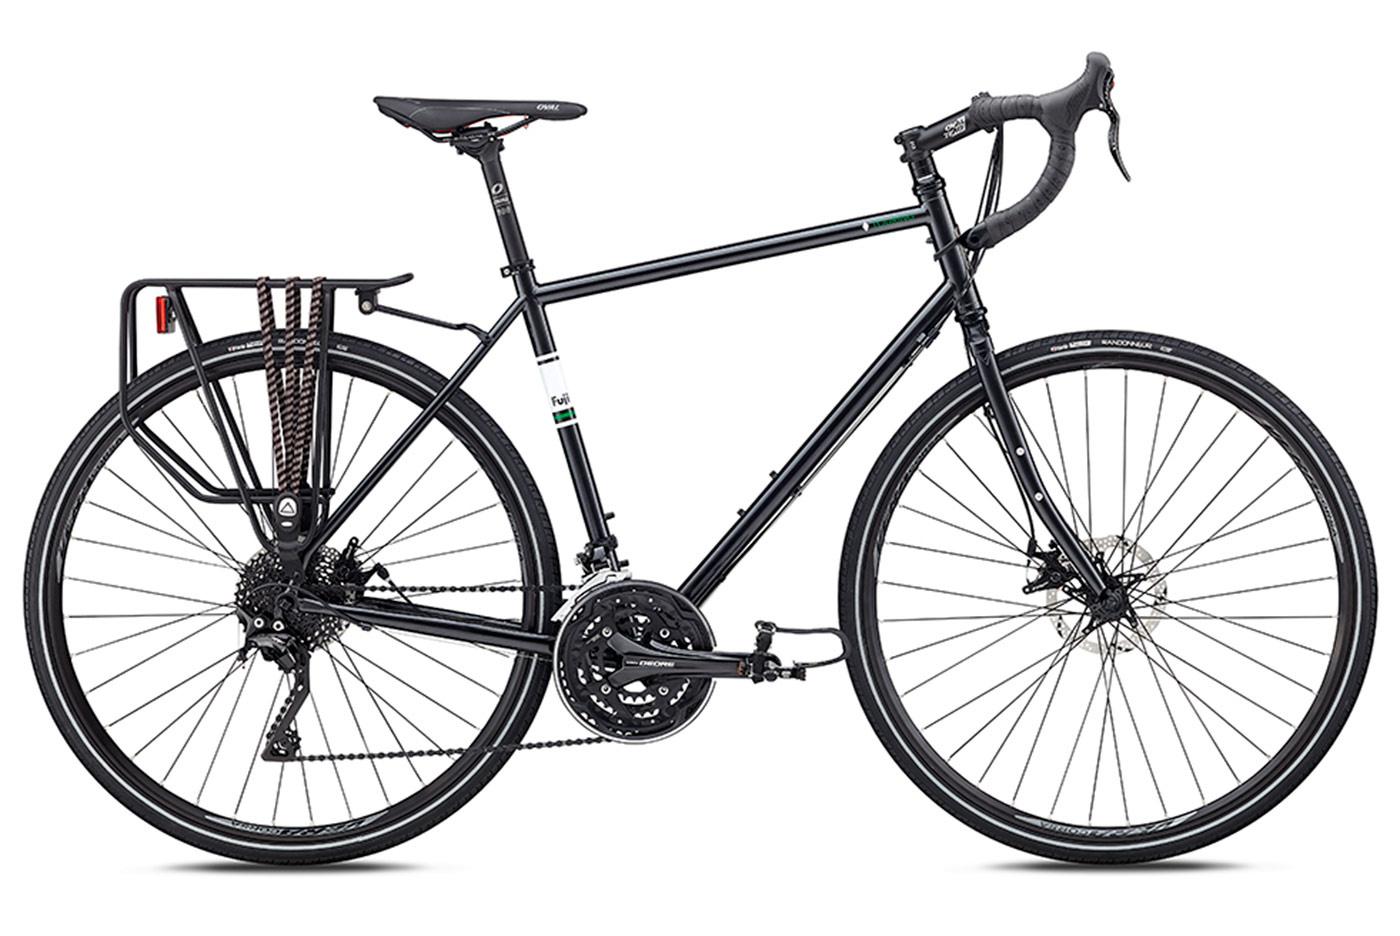 Fuji Touring Disc Anthracite 2020 Simple Bike Store